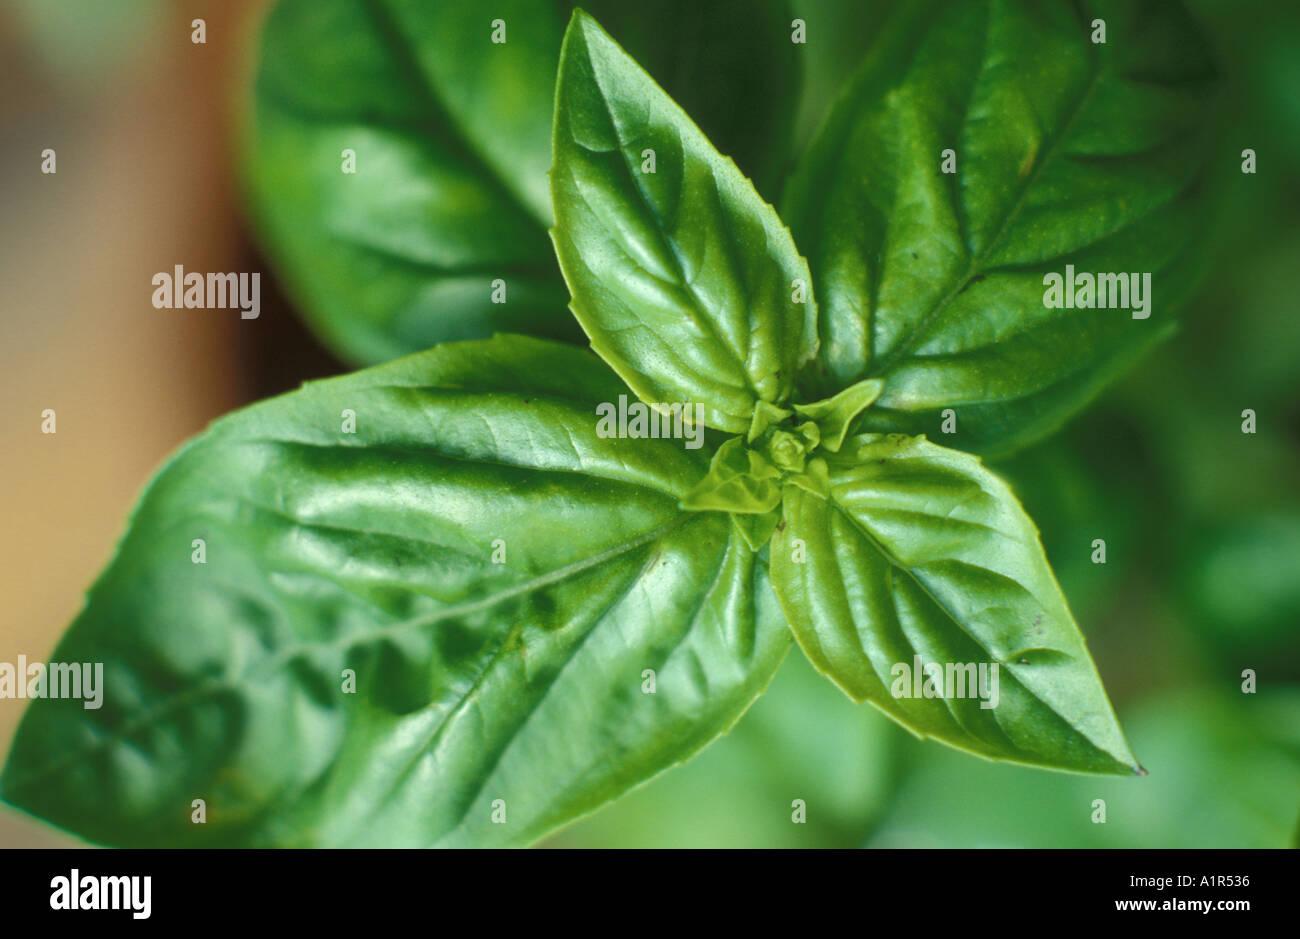 Basil - Stock Image